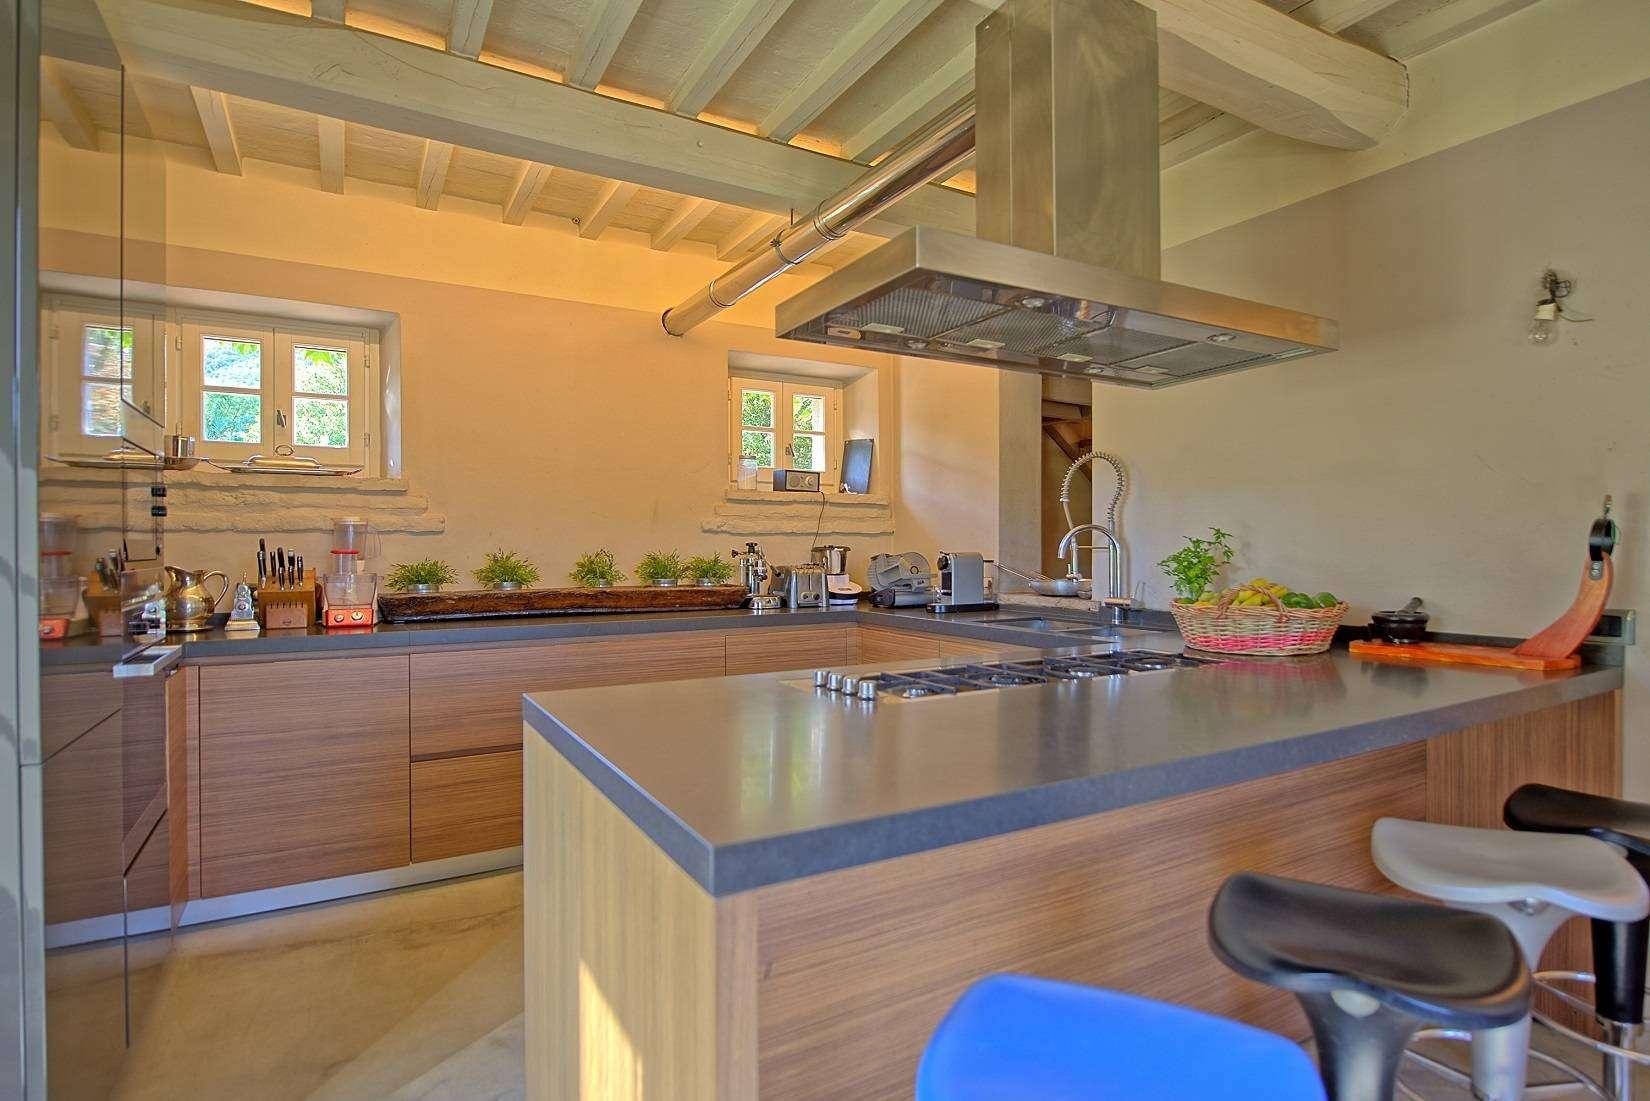 13 Jacopo Kitchen